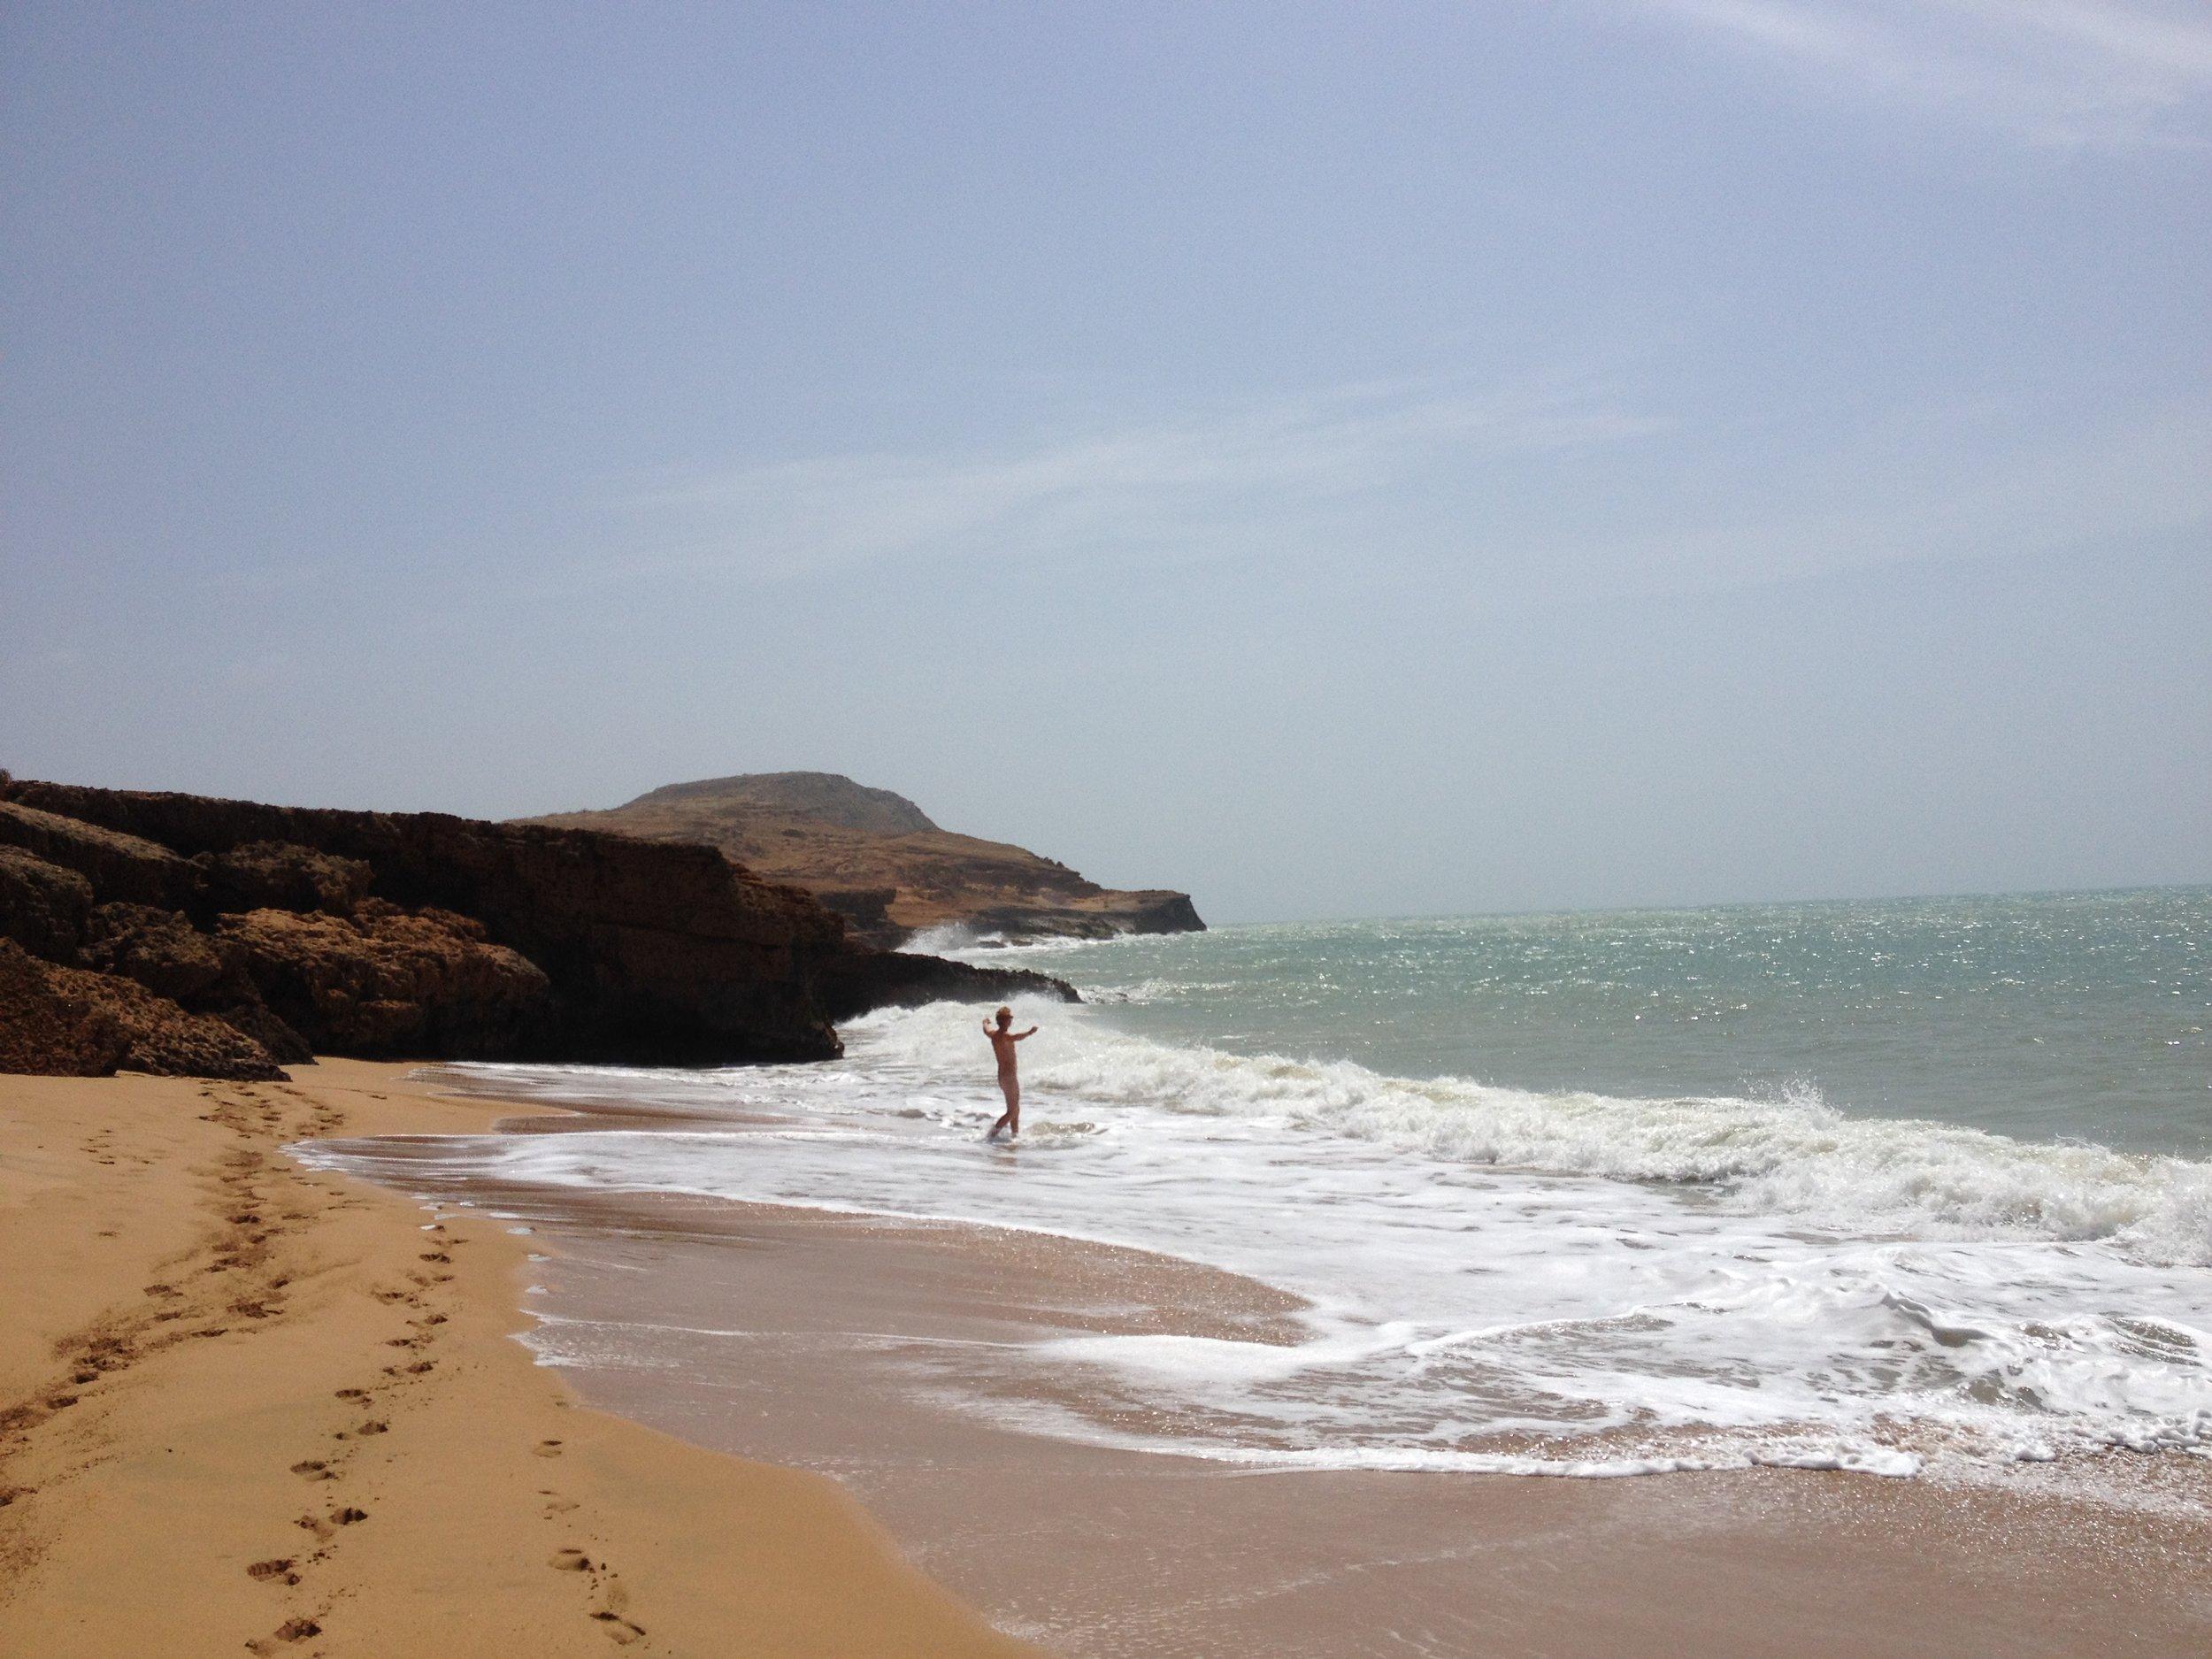 The beach at Pilon de Azucar